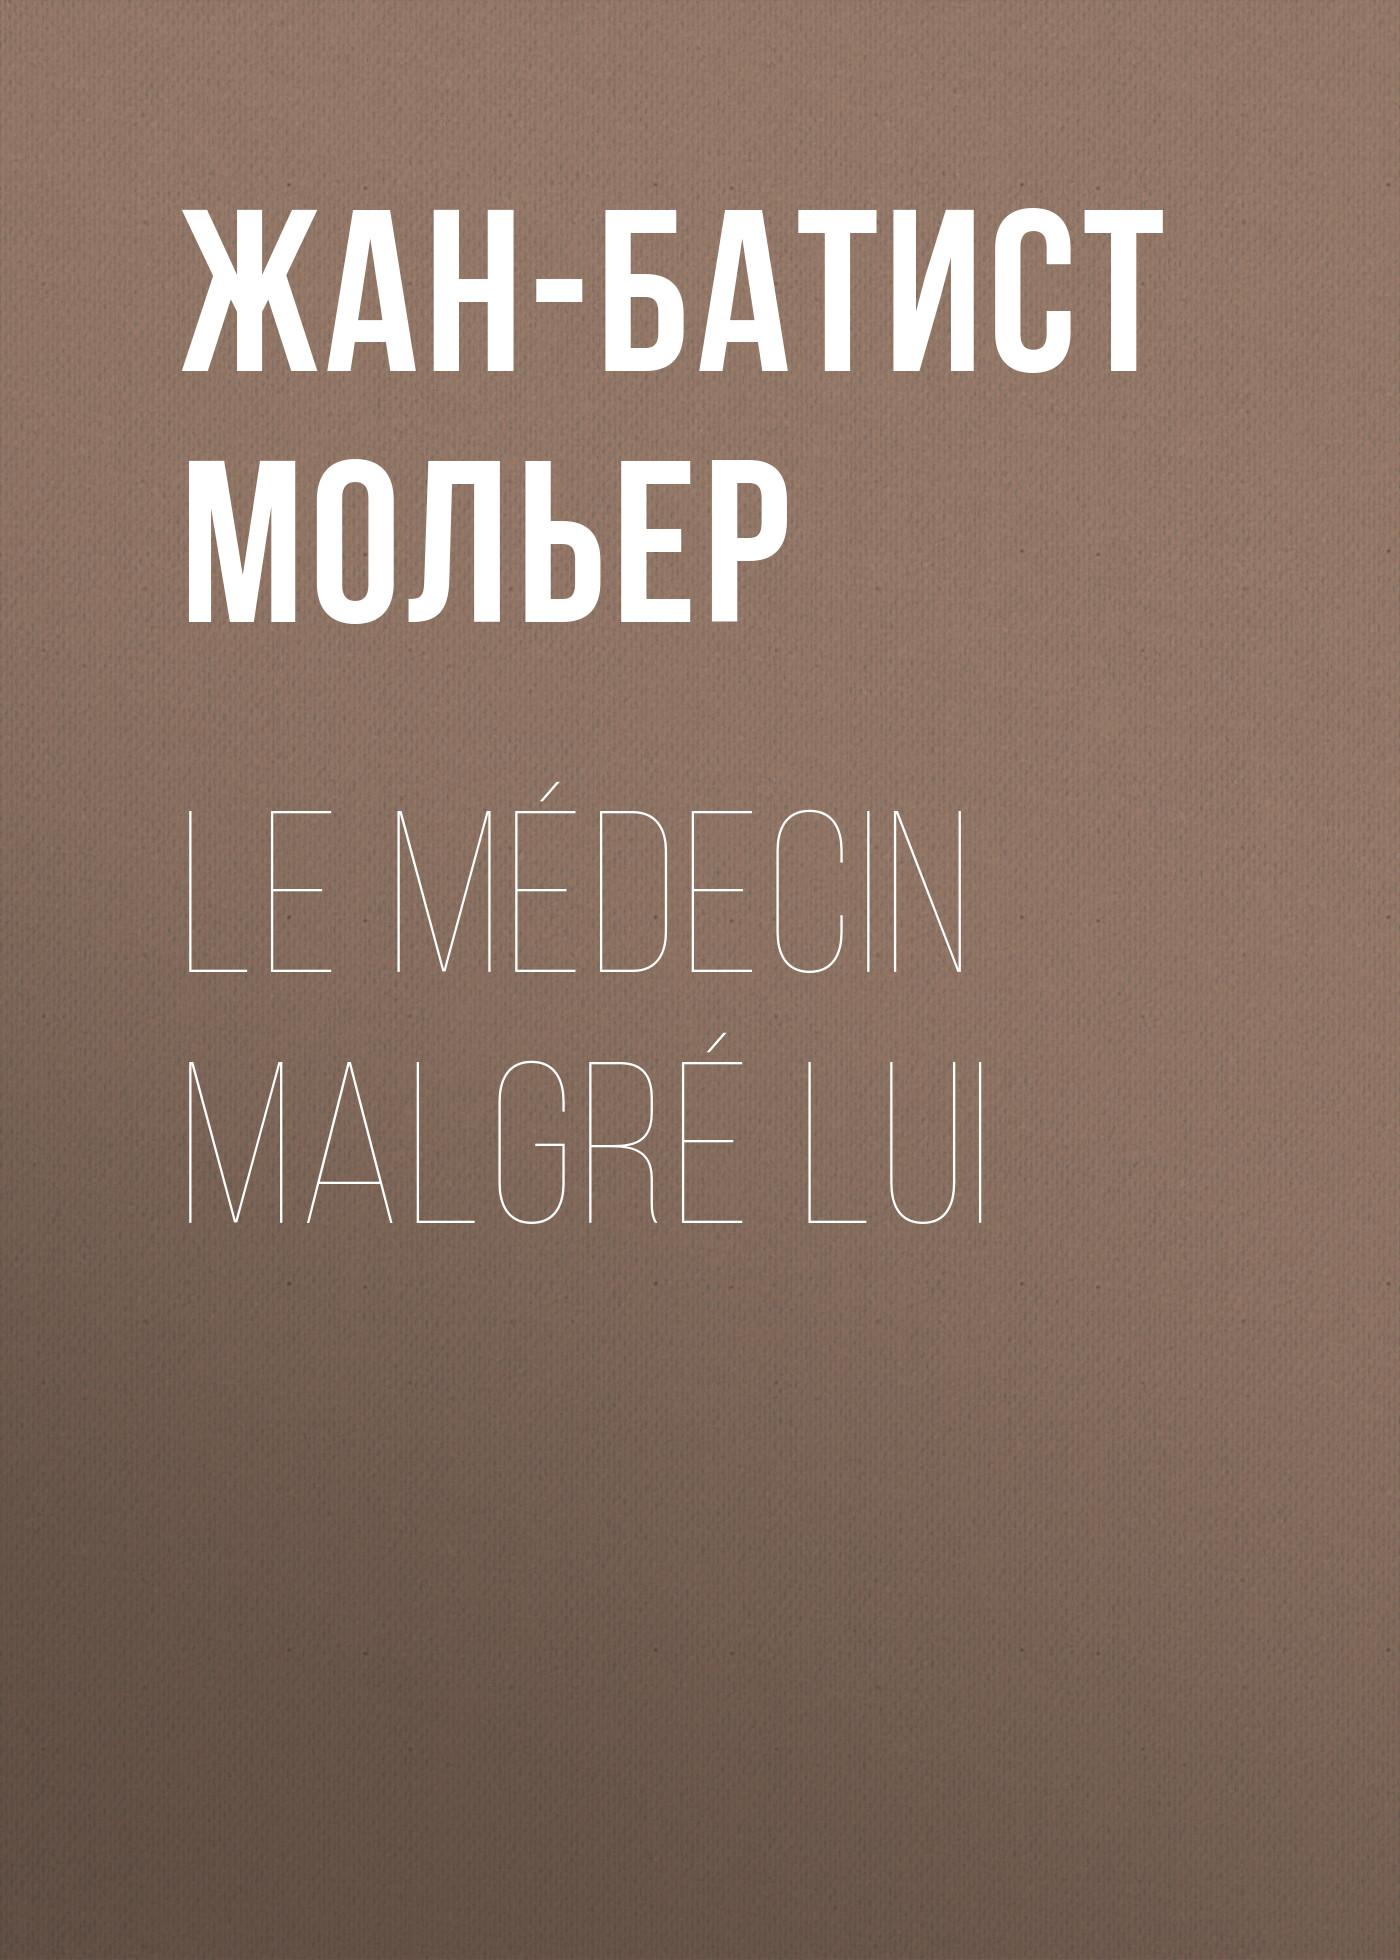 Мольер (Жан-Батист Поклен) Le médecin malgré lui батист ориджинал